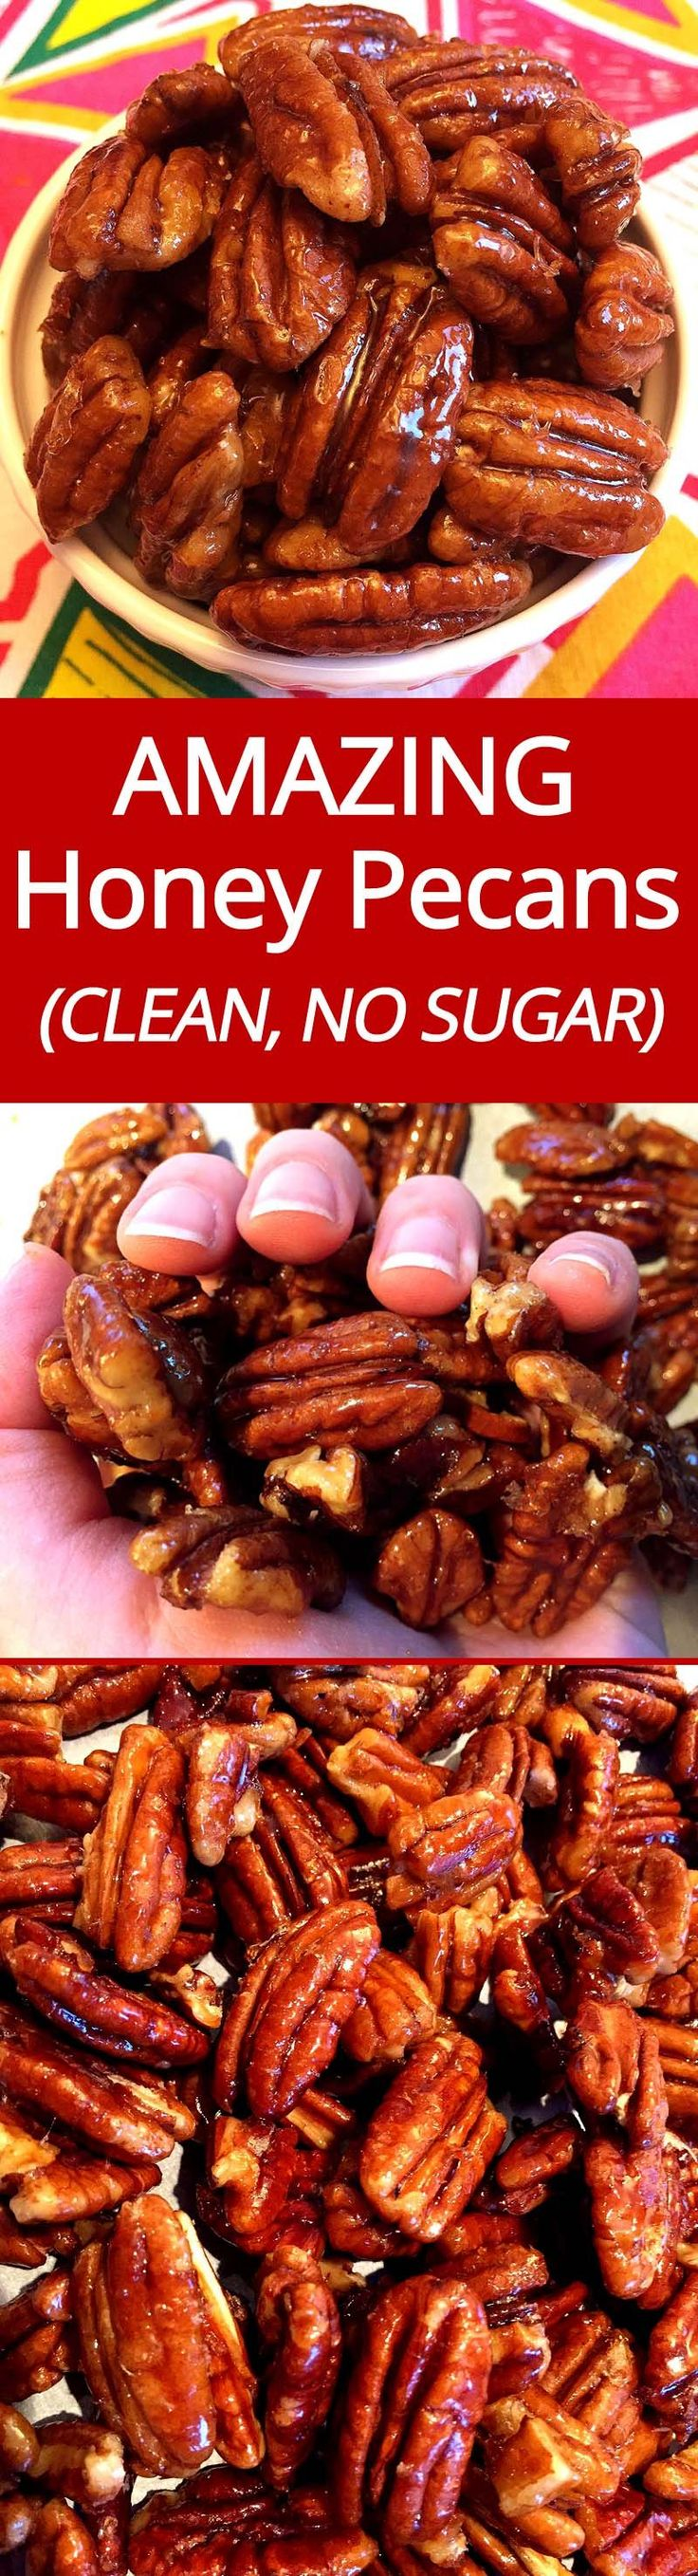 These honey candied pecans are amazing! | MelanieCooks.com #JamiesCleanEatingrecipes